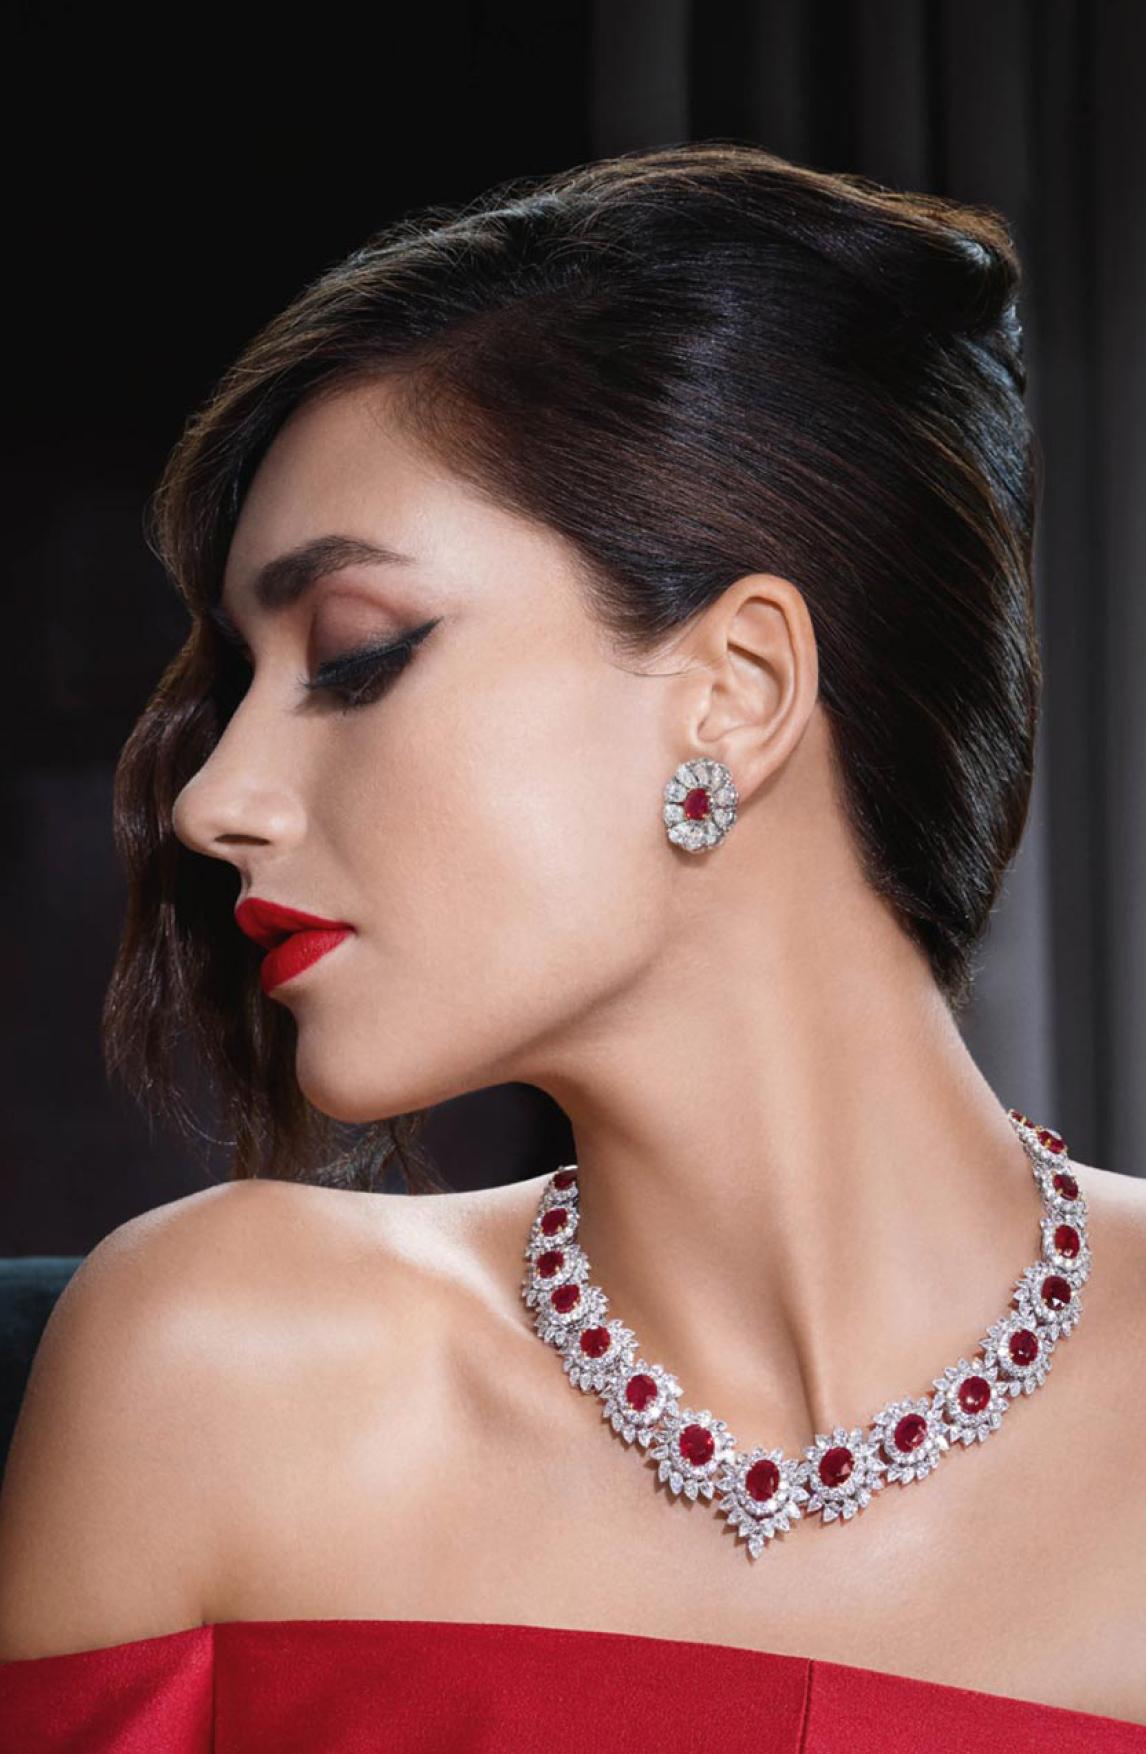 Rubies Jewellery 01 | Maria Gaspari